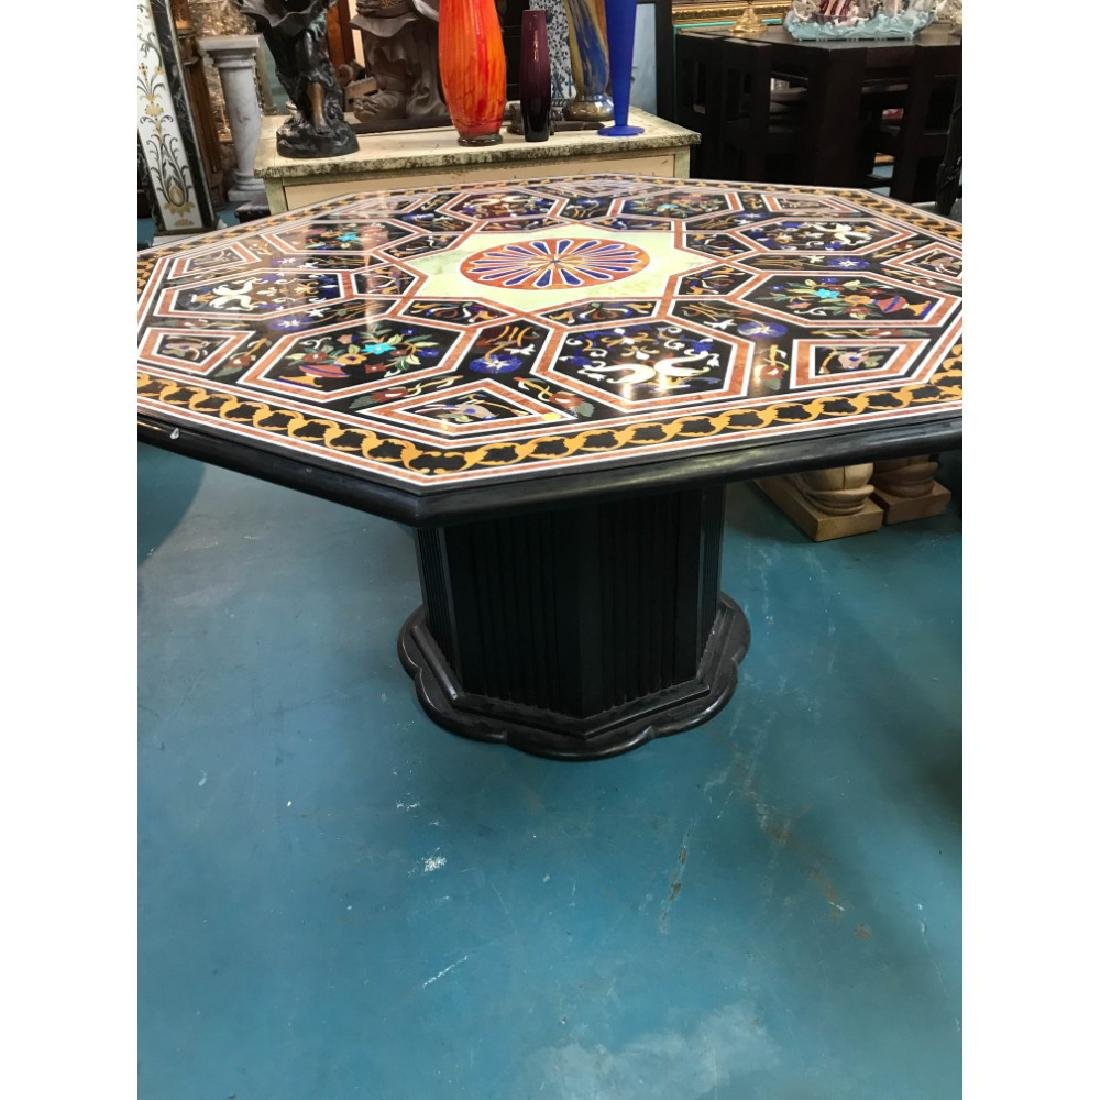 Mosaic Pietra Dura Octagon-Shaped Table - 4